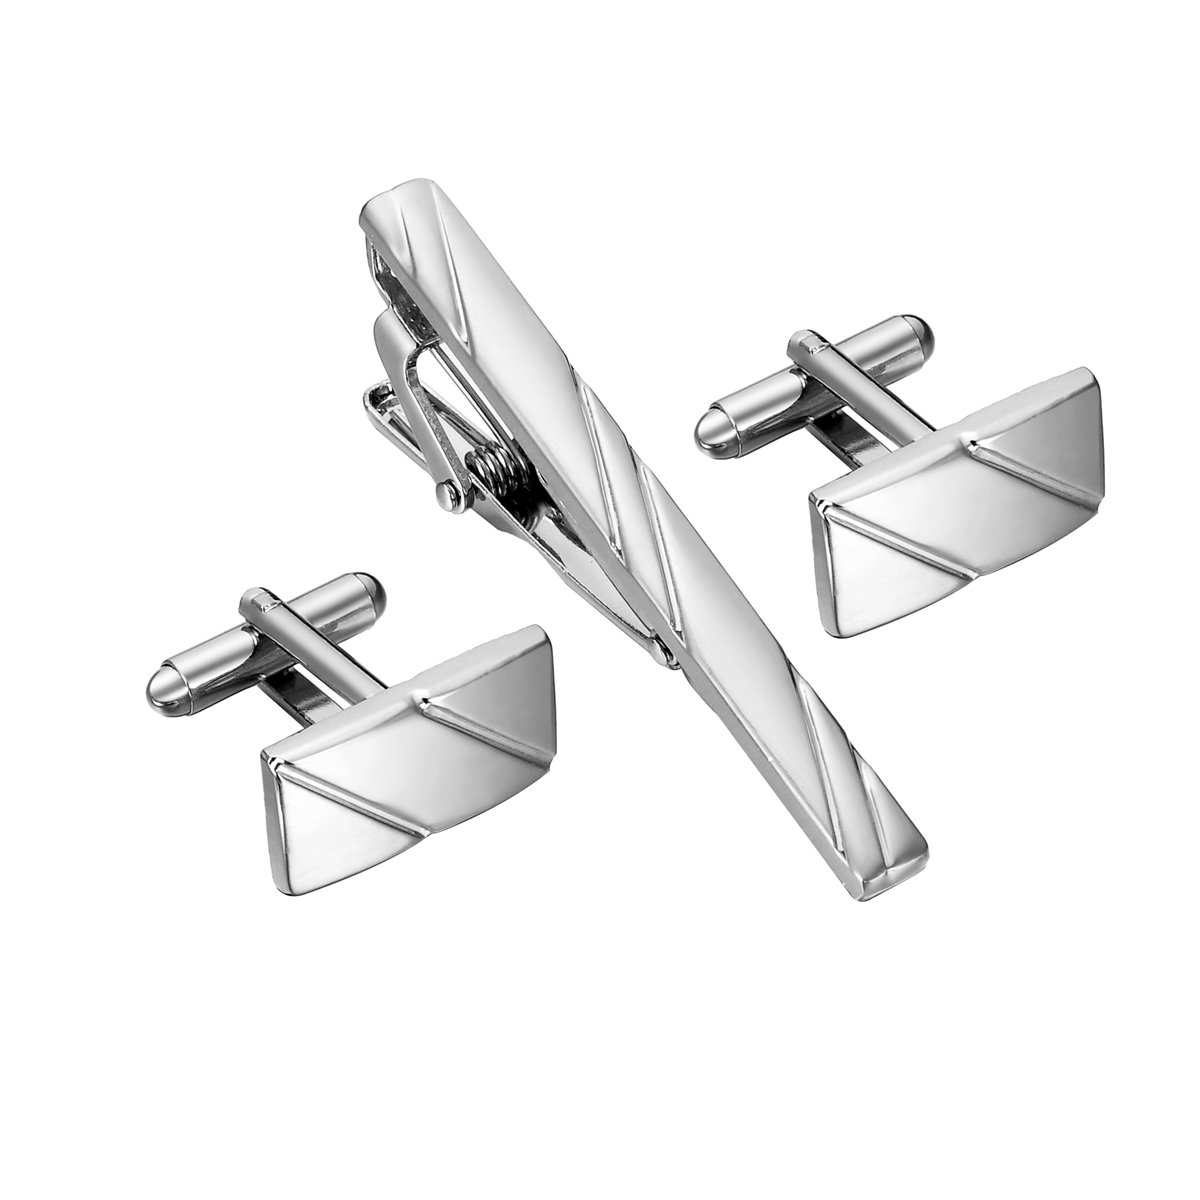 HooAMI Classic Mens Copper Tie Clip Cufflink Set, Silver Tone TY BETY105005